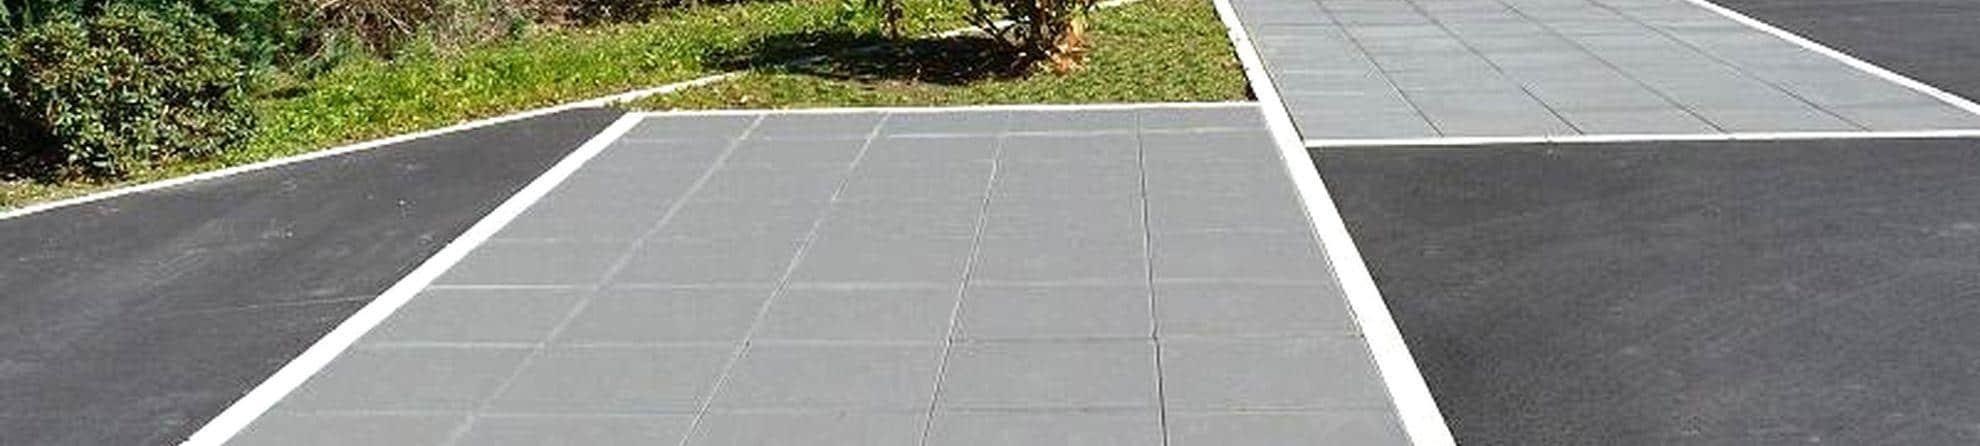 Dalle Beton Pour Allee dalle en beton terrasse jardin allee garage - interblocs